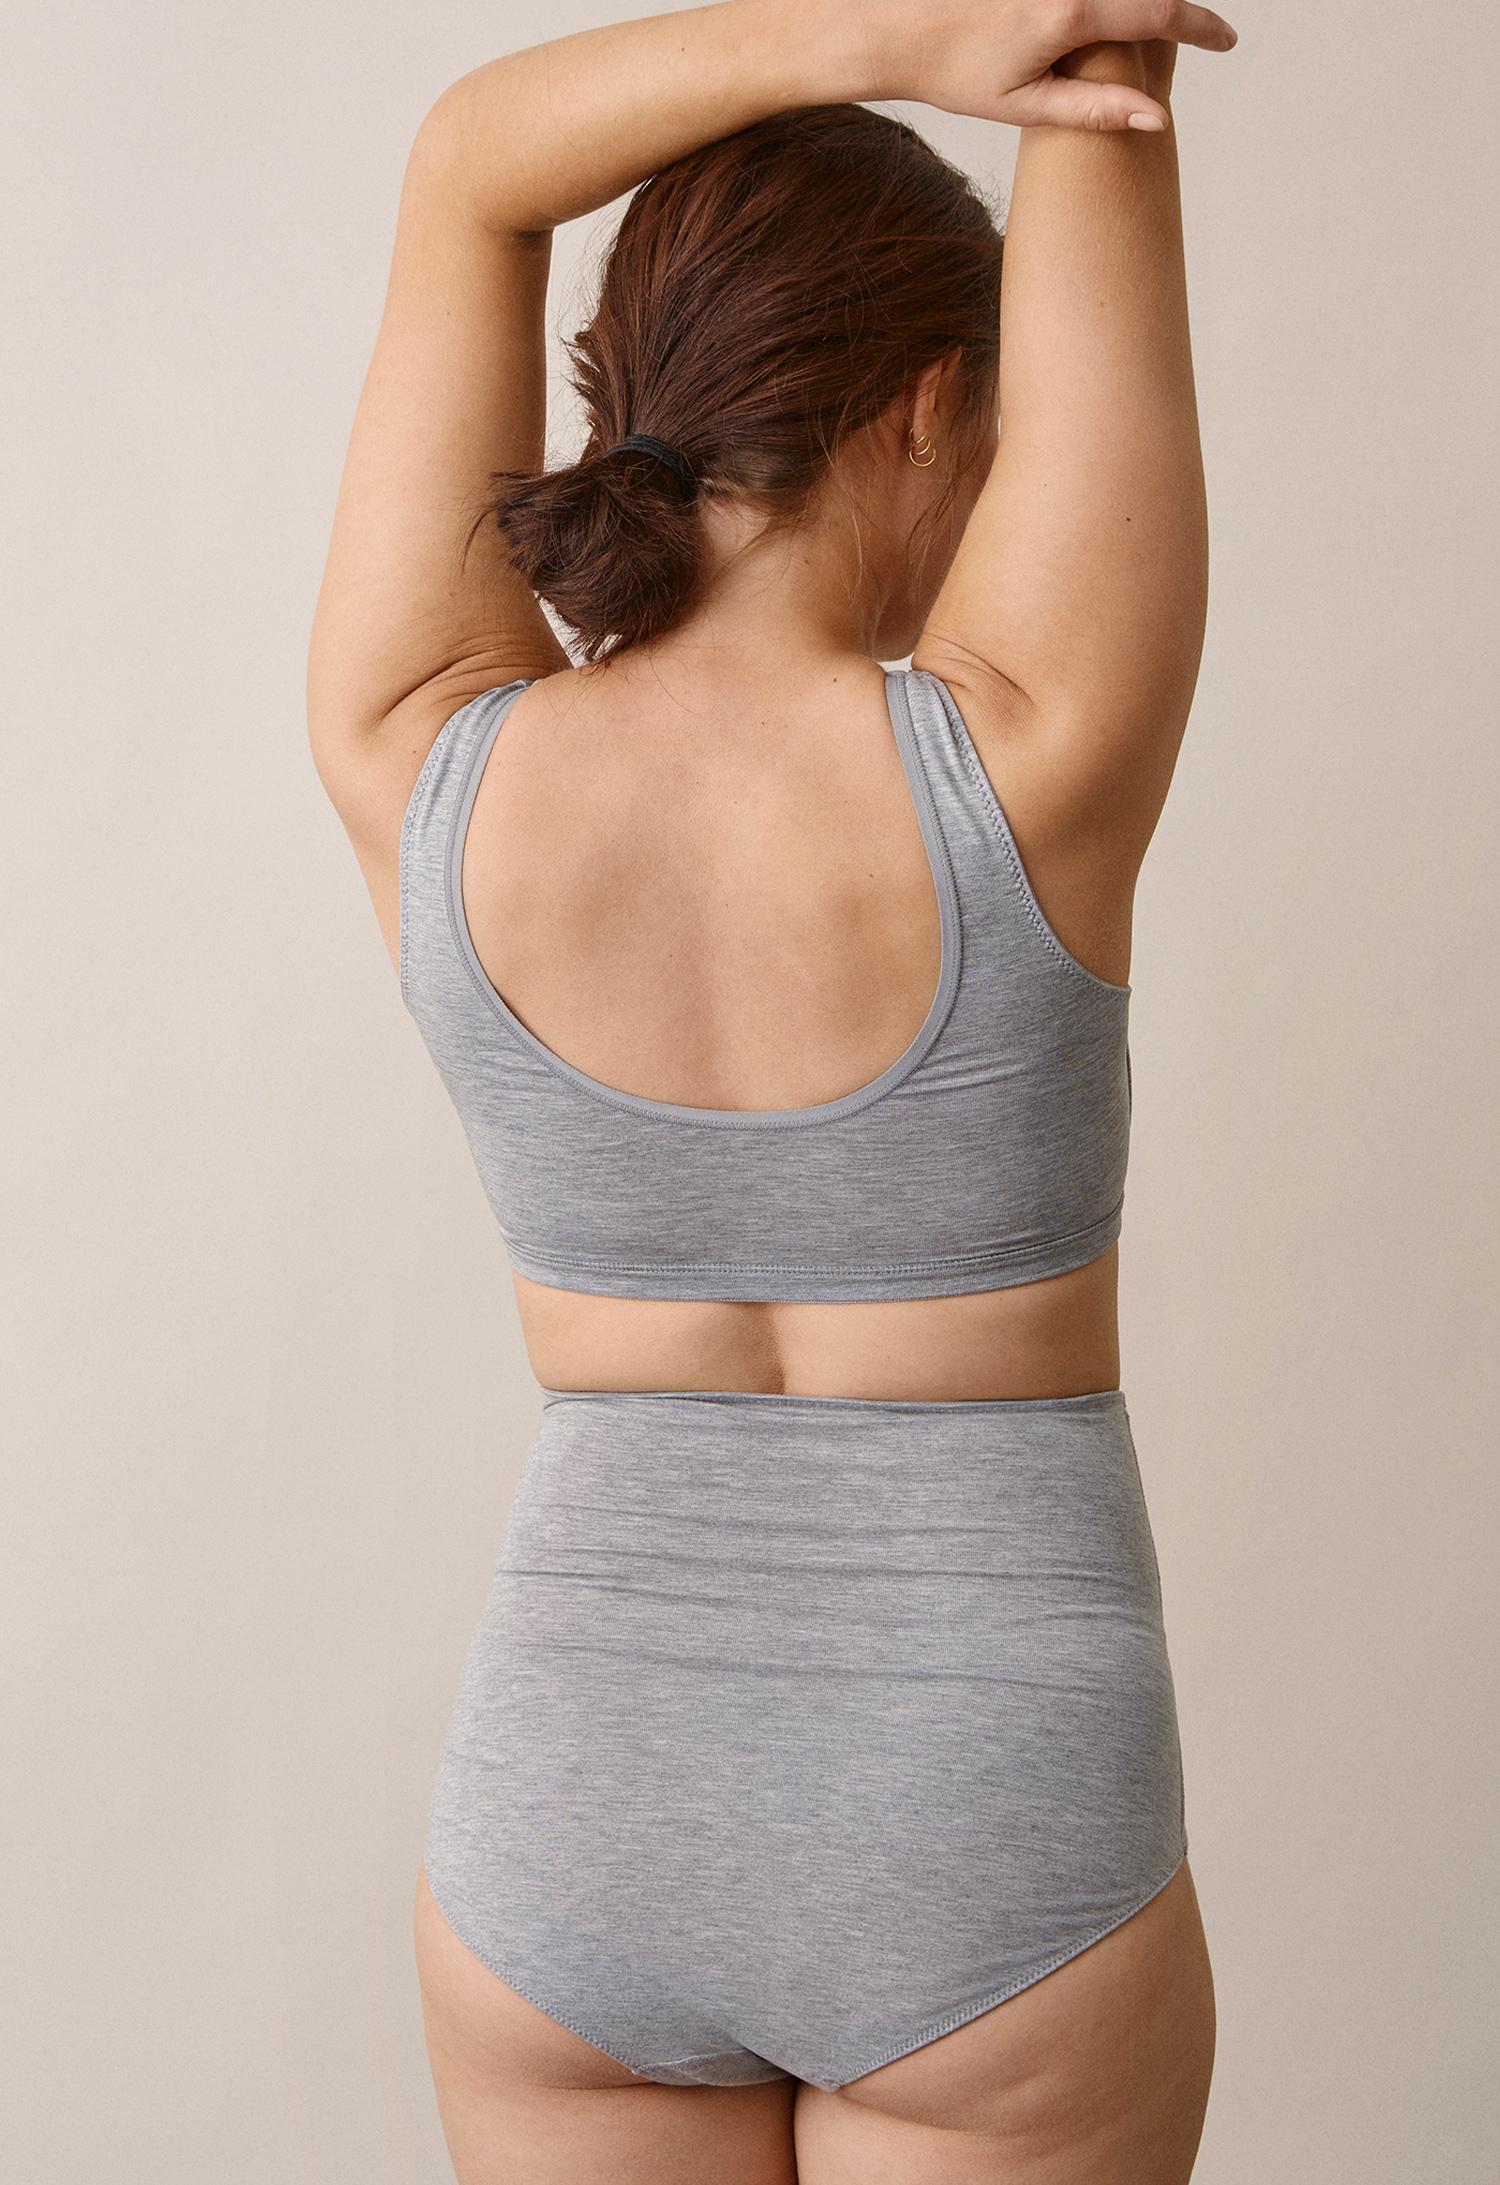 24/7 bragrey melange (3) - Maternity underwear / Nursing underwear